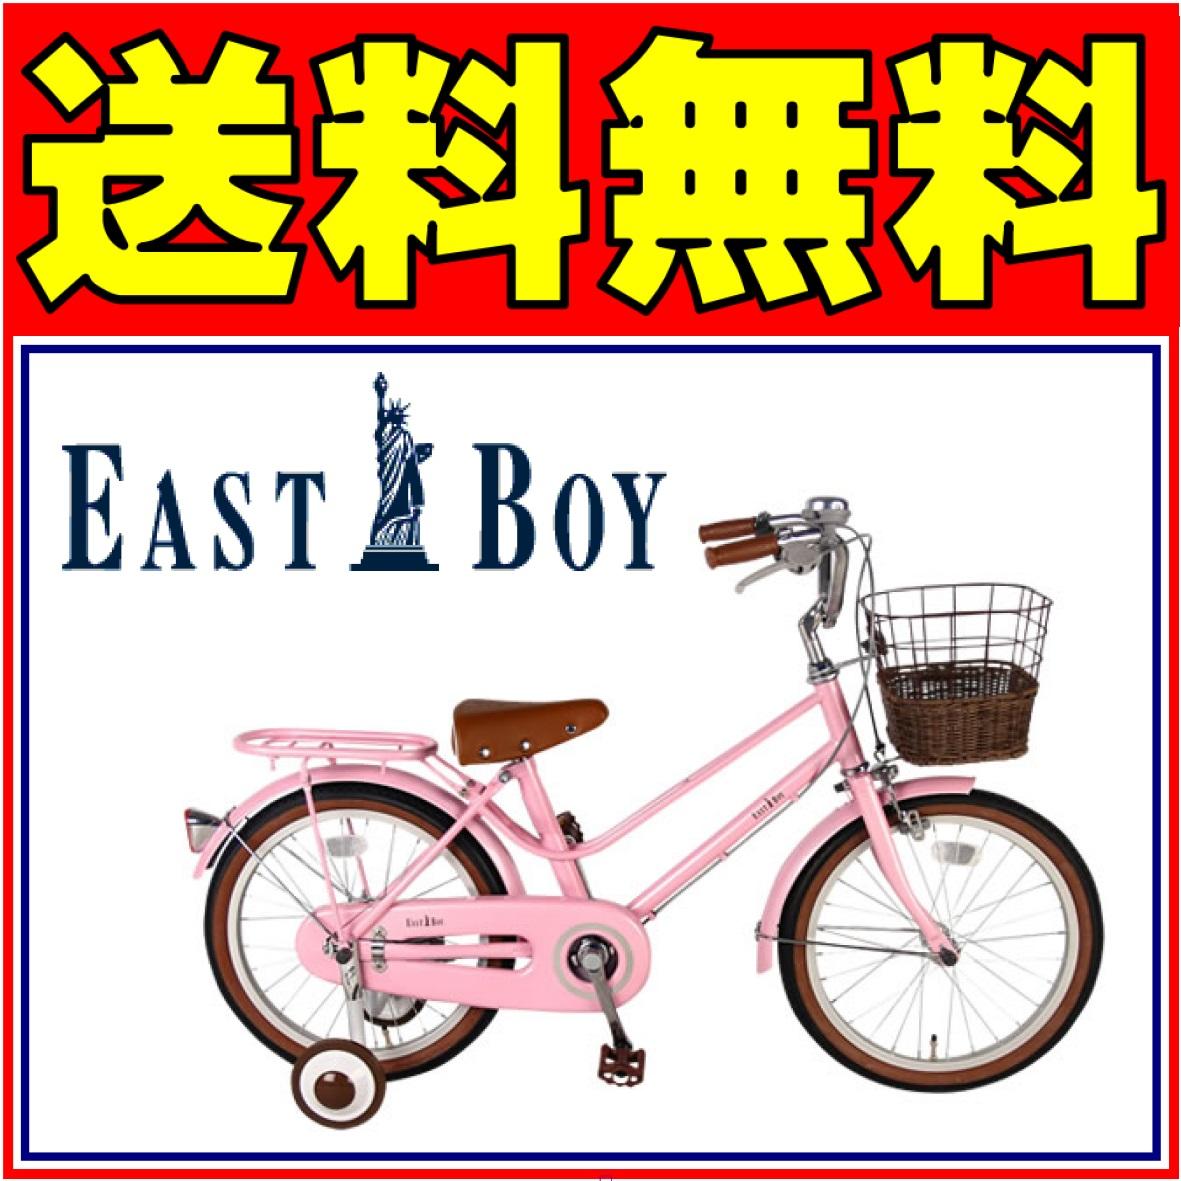 EASTBOY イーストボーイ 自転車 シティサイクル ピンク 大人かわいい キッズ 18インチ イーストボーイ 自転車 女子 女の子 子ども用 子供